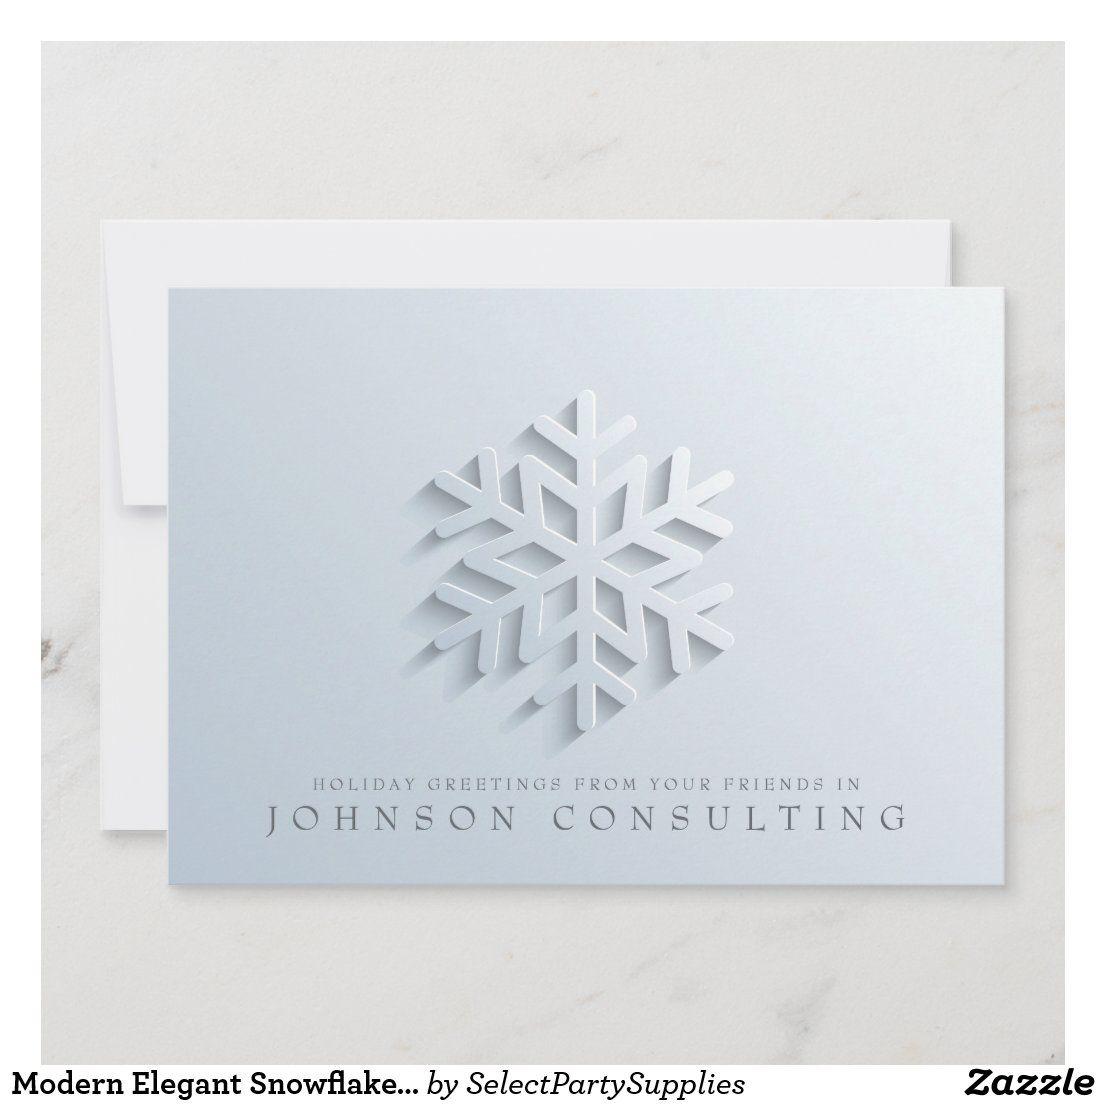 Modern Elegant Snowflake Holiday Greetings Zazzle Com Elegant Snowflake Holiday Greetings Holiday Design Card